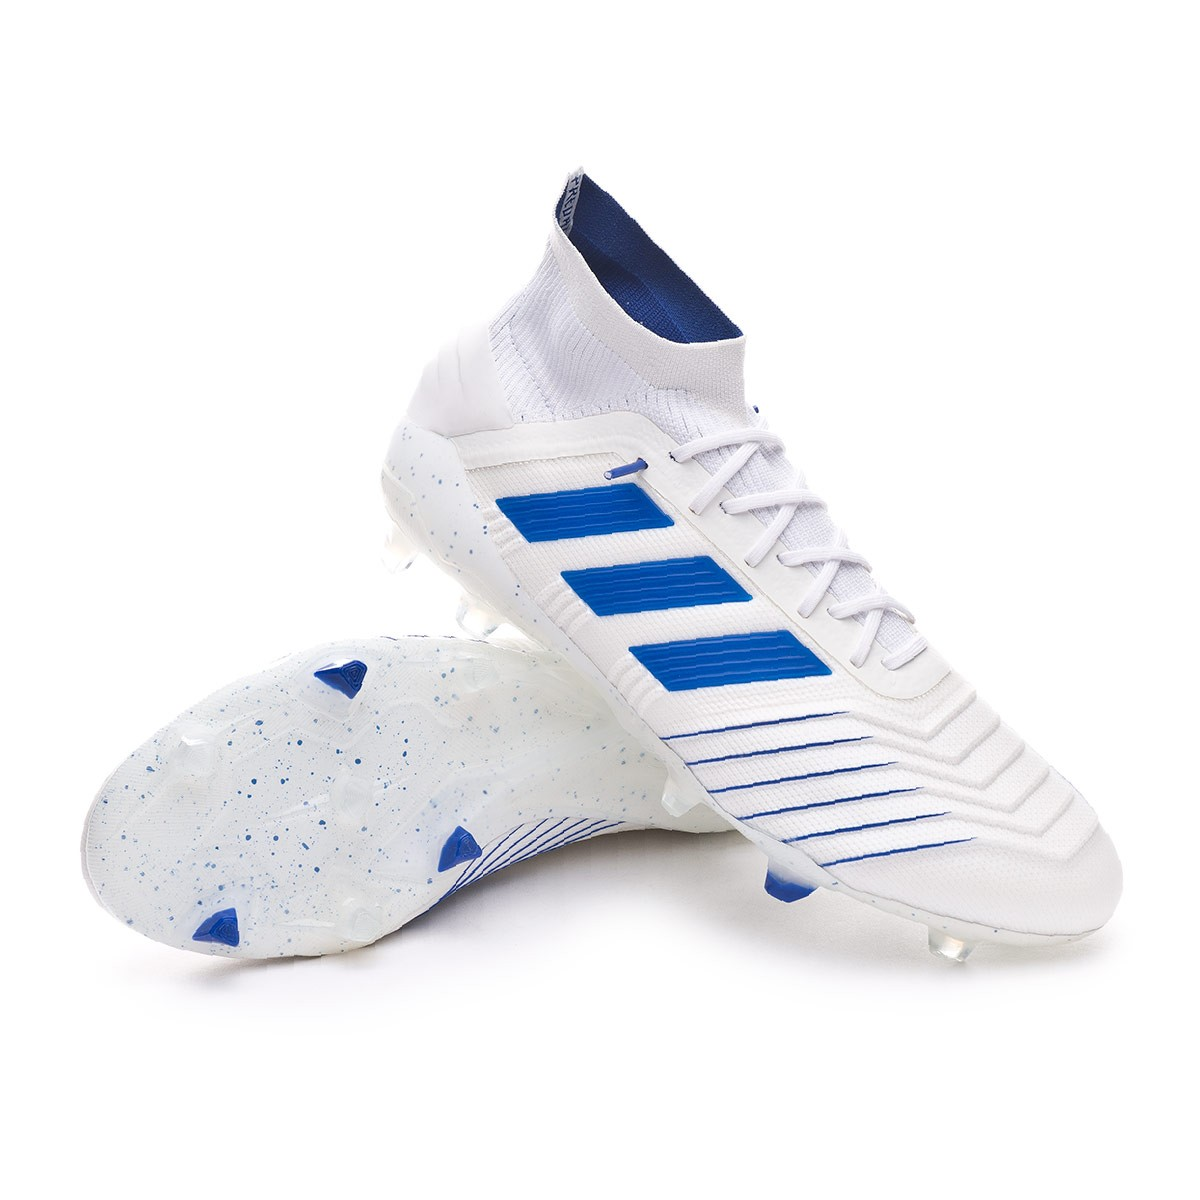 Chaussure de foot adidas Predator 19.1 FG